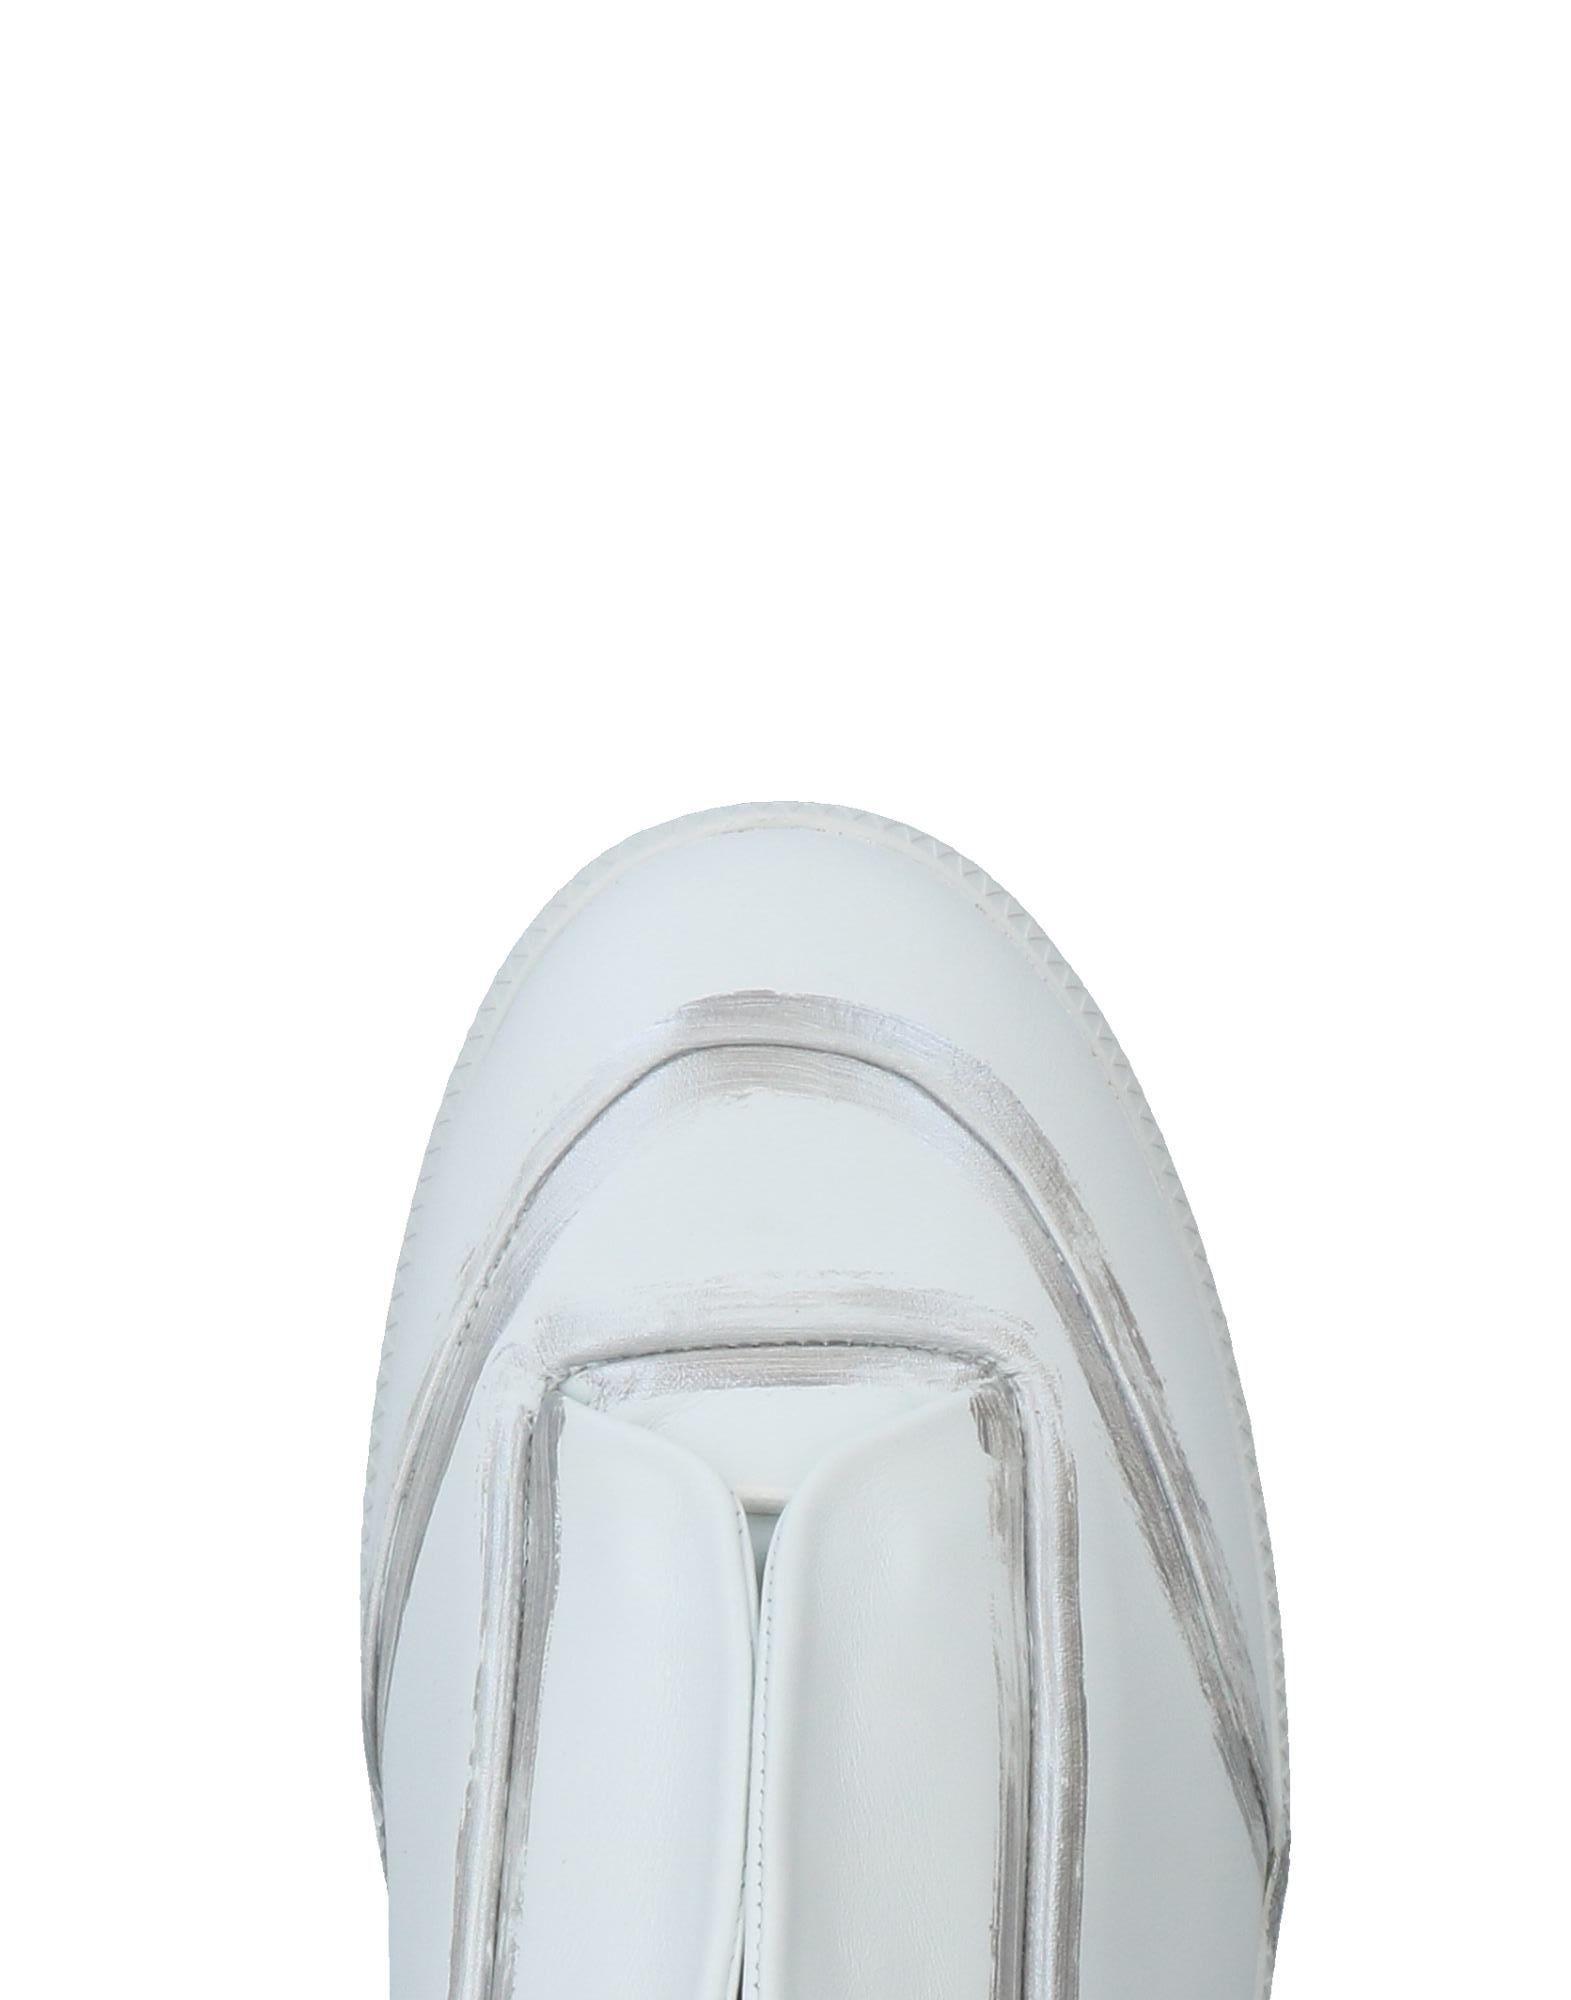 Maison Margiela Sneakers Herren  11341627TM Gute Qualität beliebte Schuhe